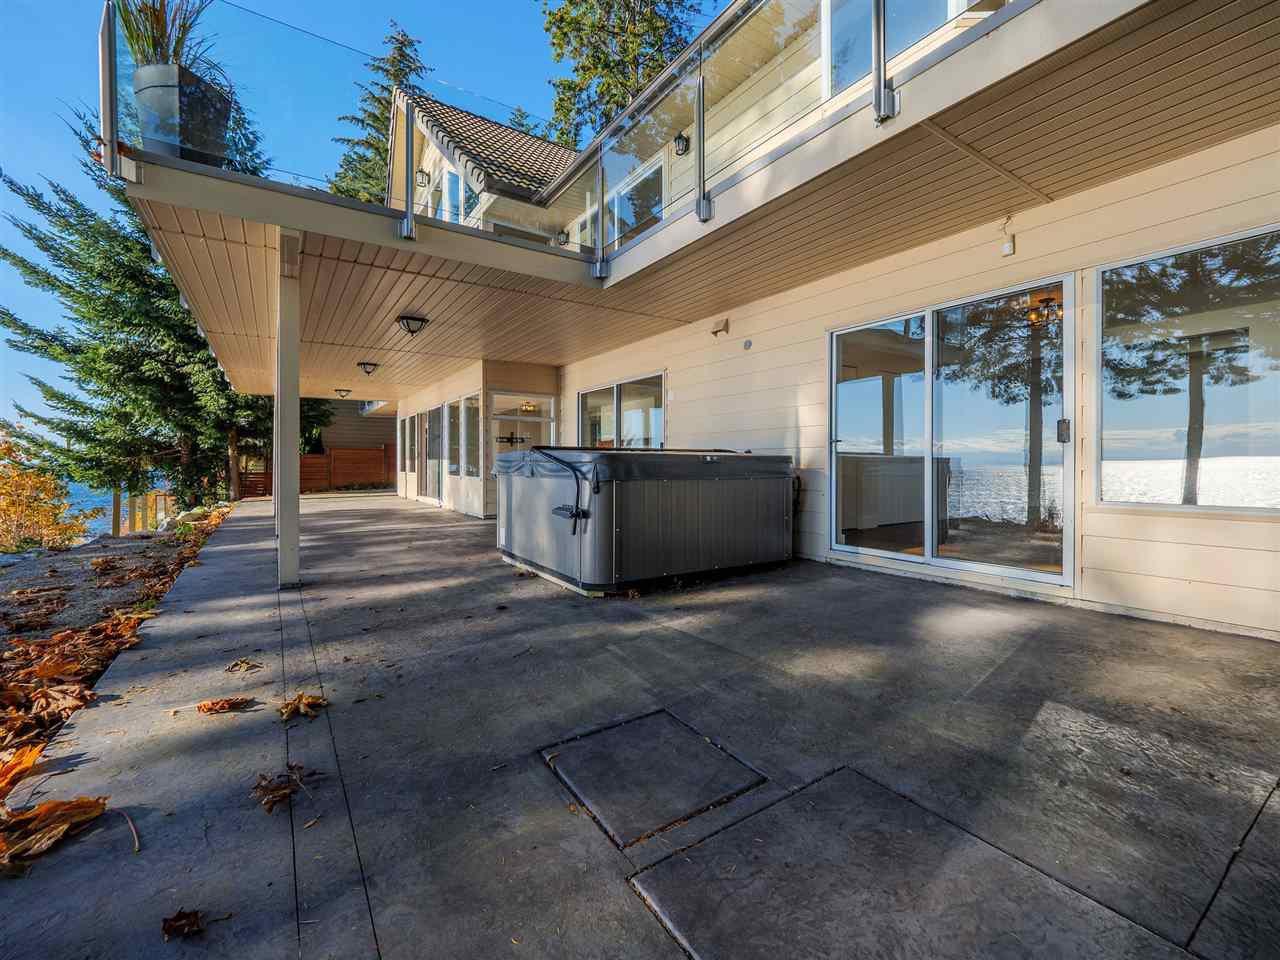 "Photo 8: Photos: 7101 DALE Road in Sechelt: Sechelt District House for sale in ""Caleda Estates"" (Sunshine Coast)  : MLS®# R2515160"